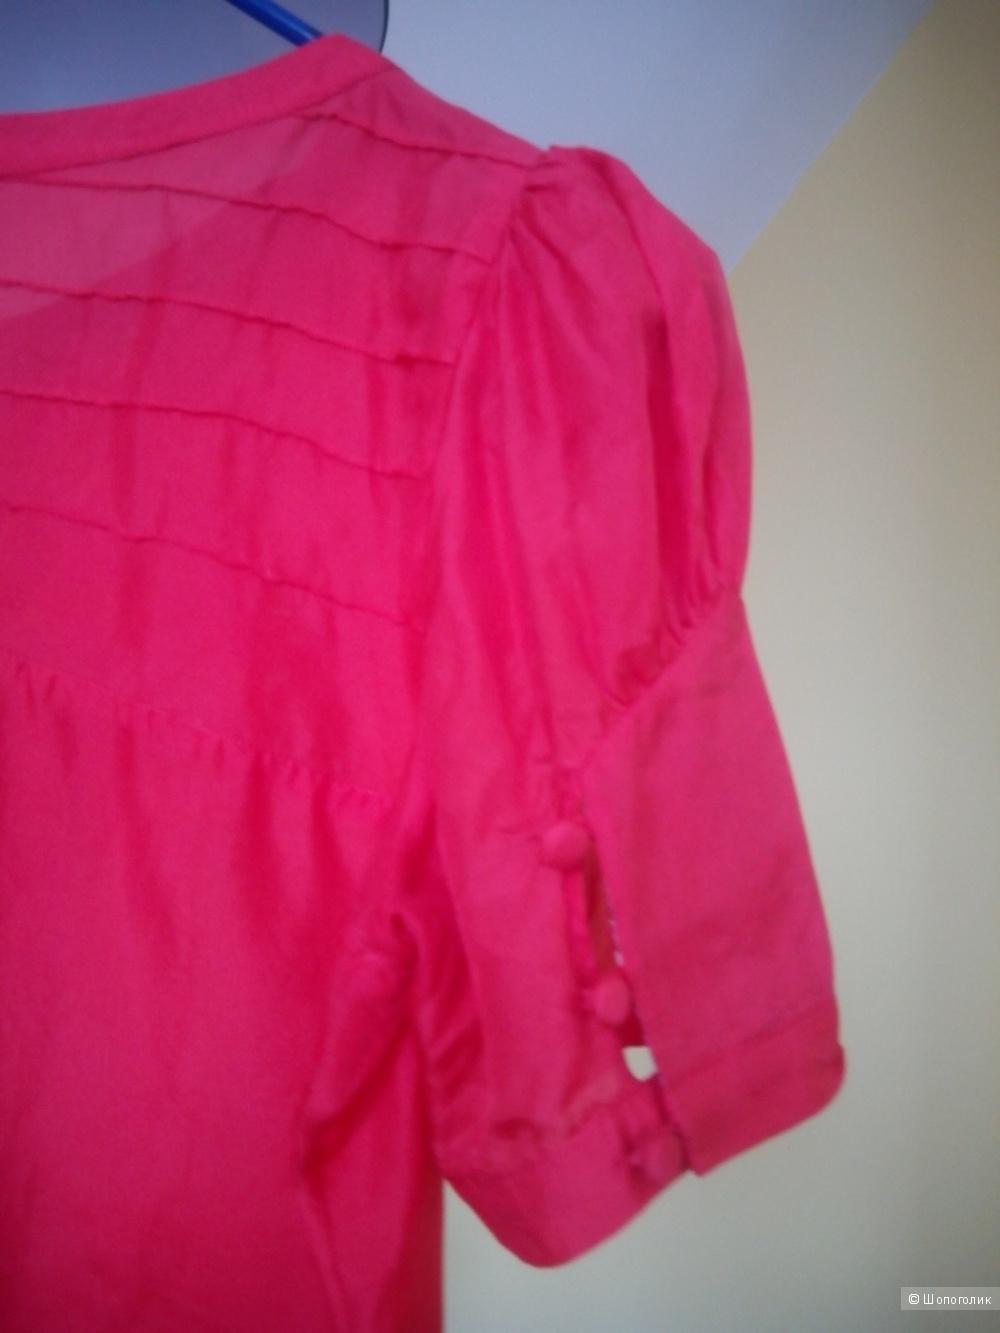 Красивая красно-коралловая блузка из натурального шелка Pepe Jeans размер М